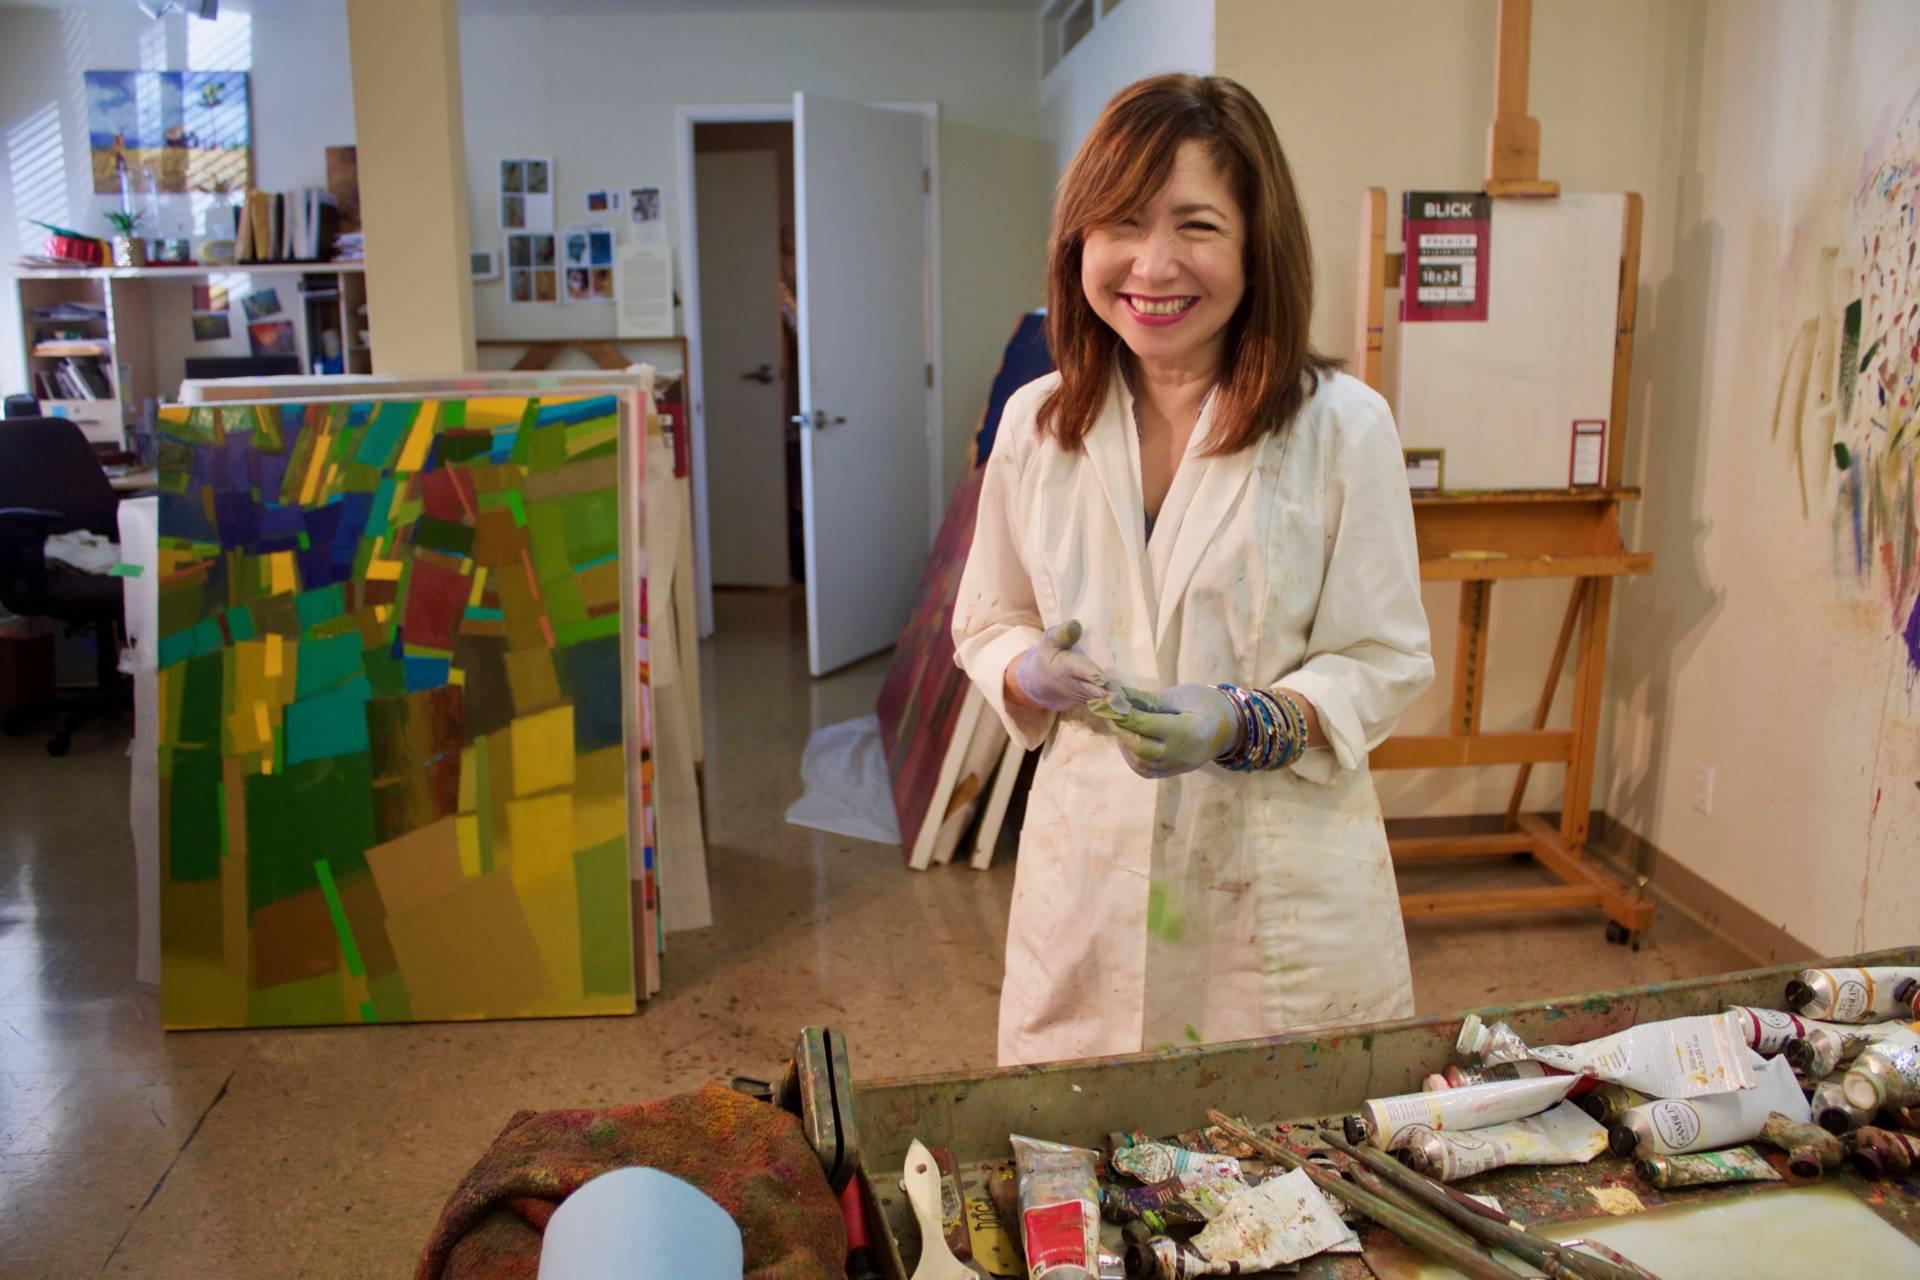 Janine Barrera-Castillo works in her studio in Vallejo, California on Oct. 6, 2017. Audrey Garces/KQED